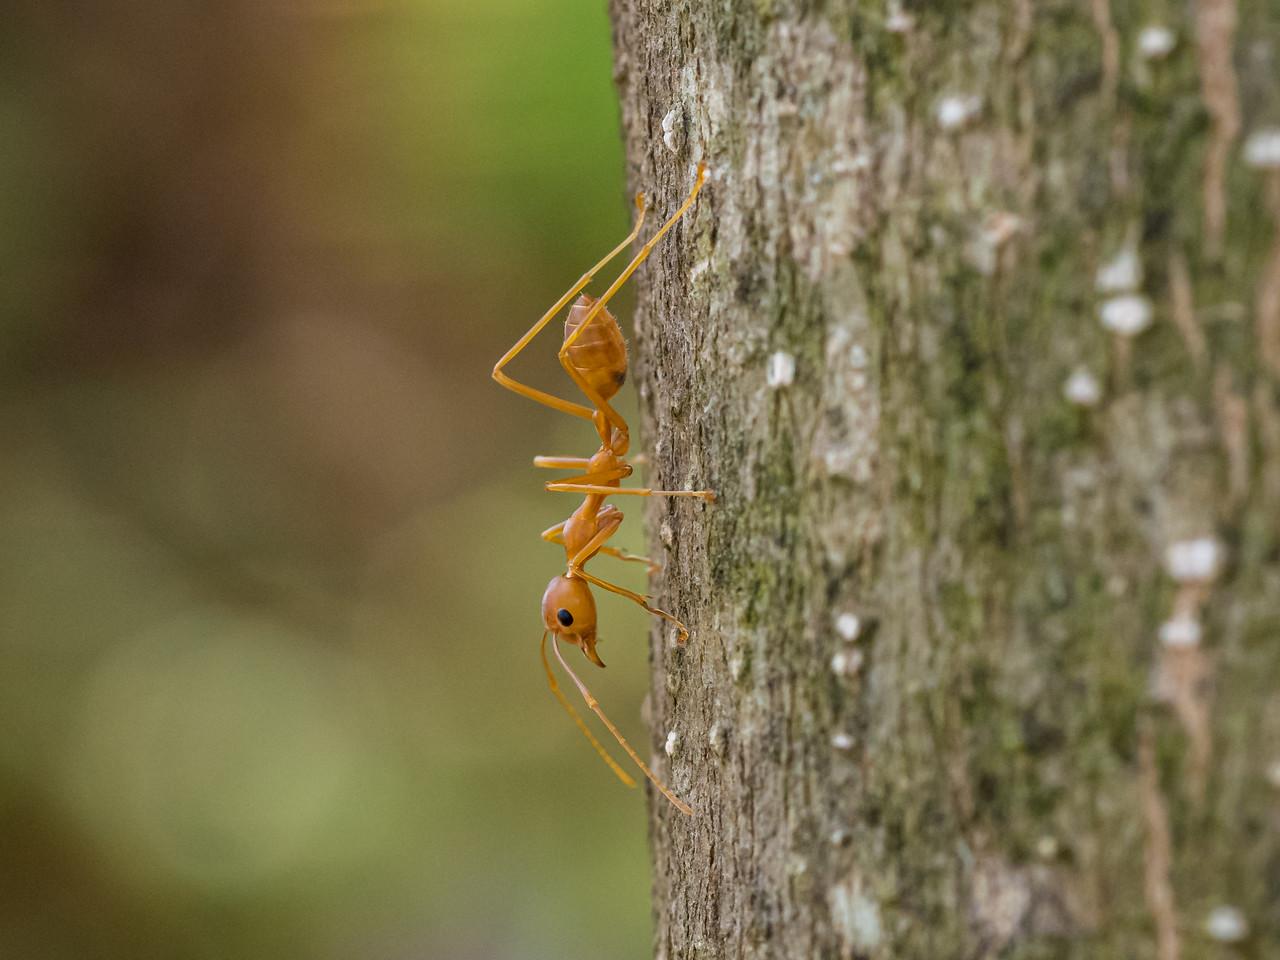 Leaf Ant